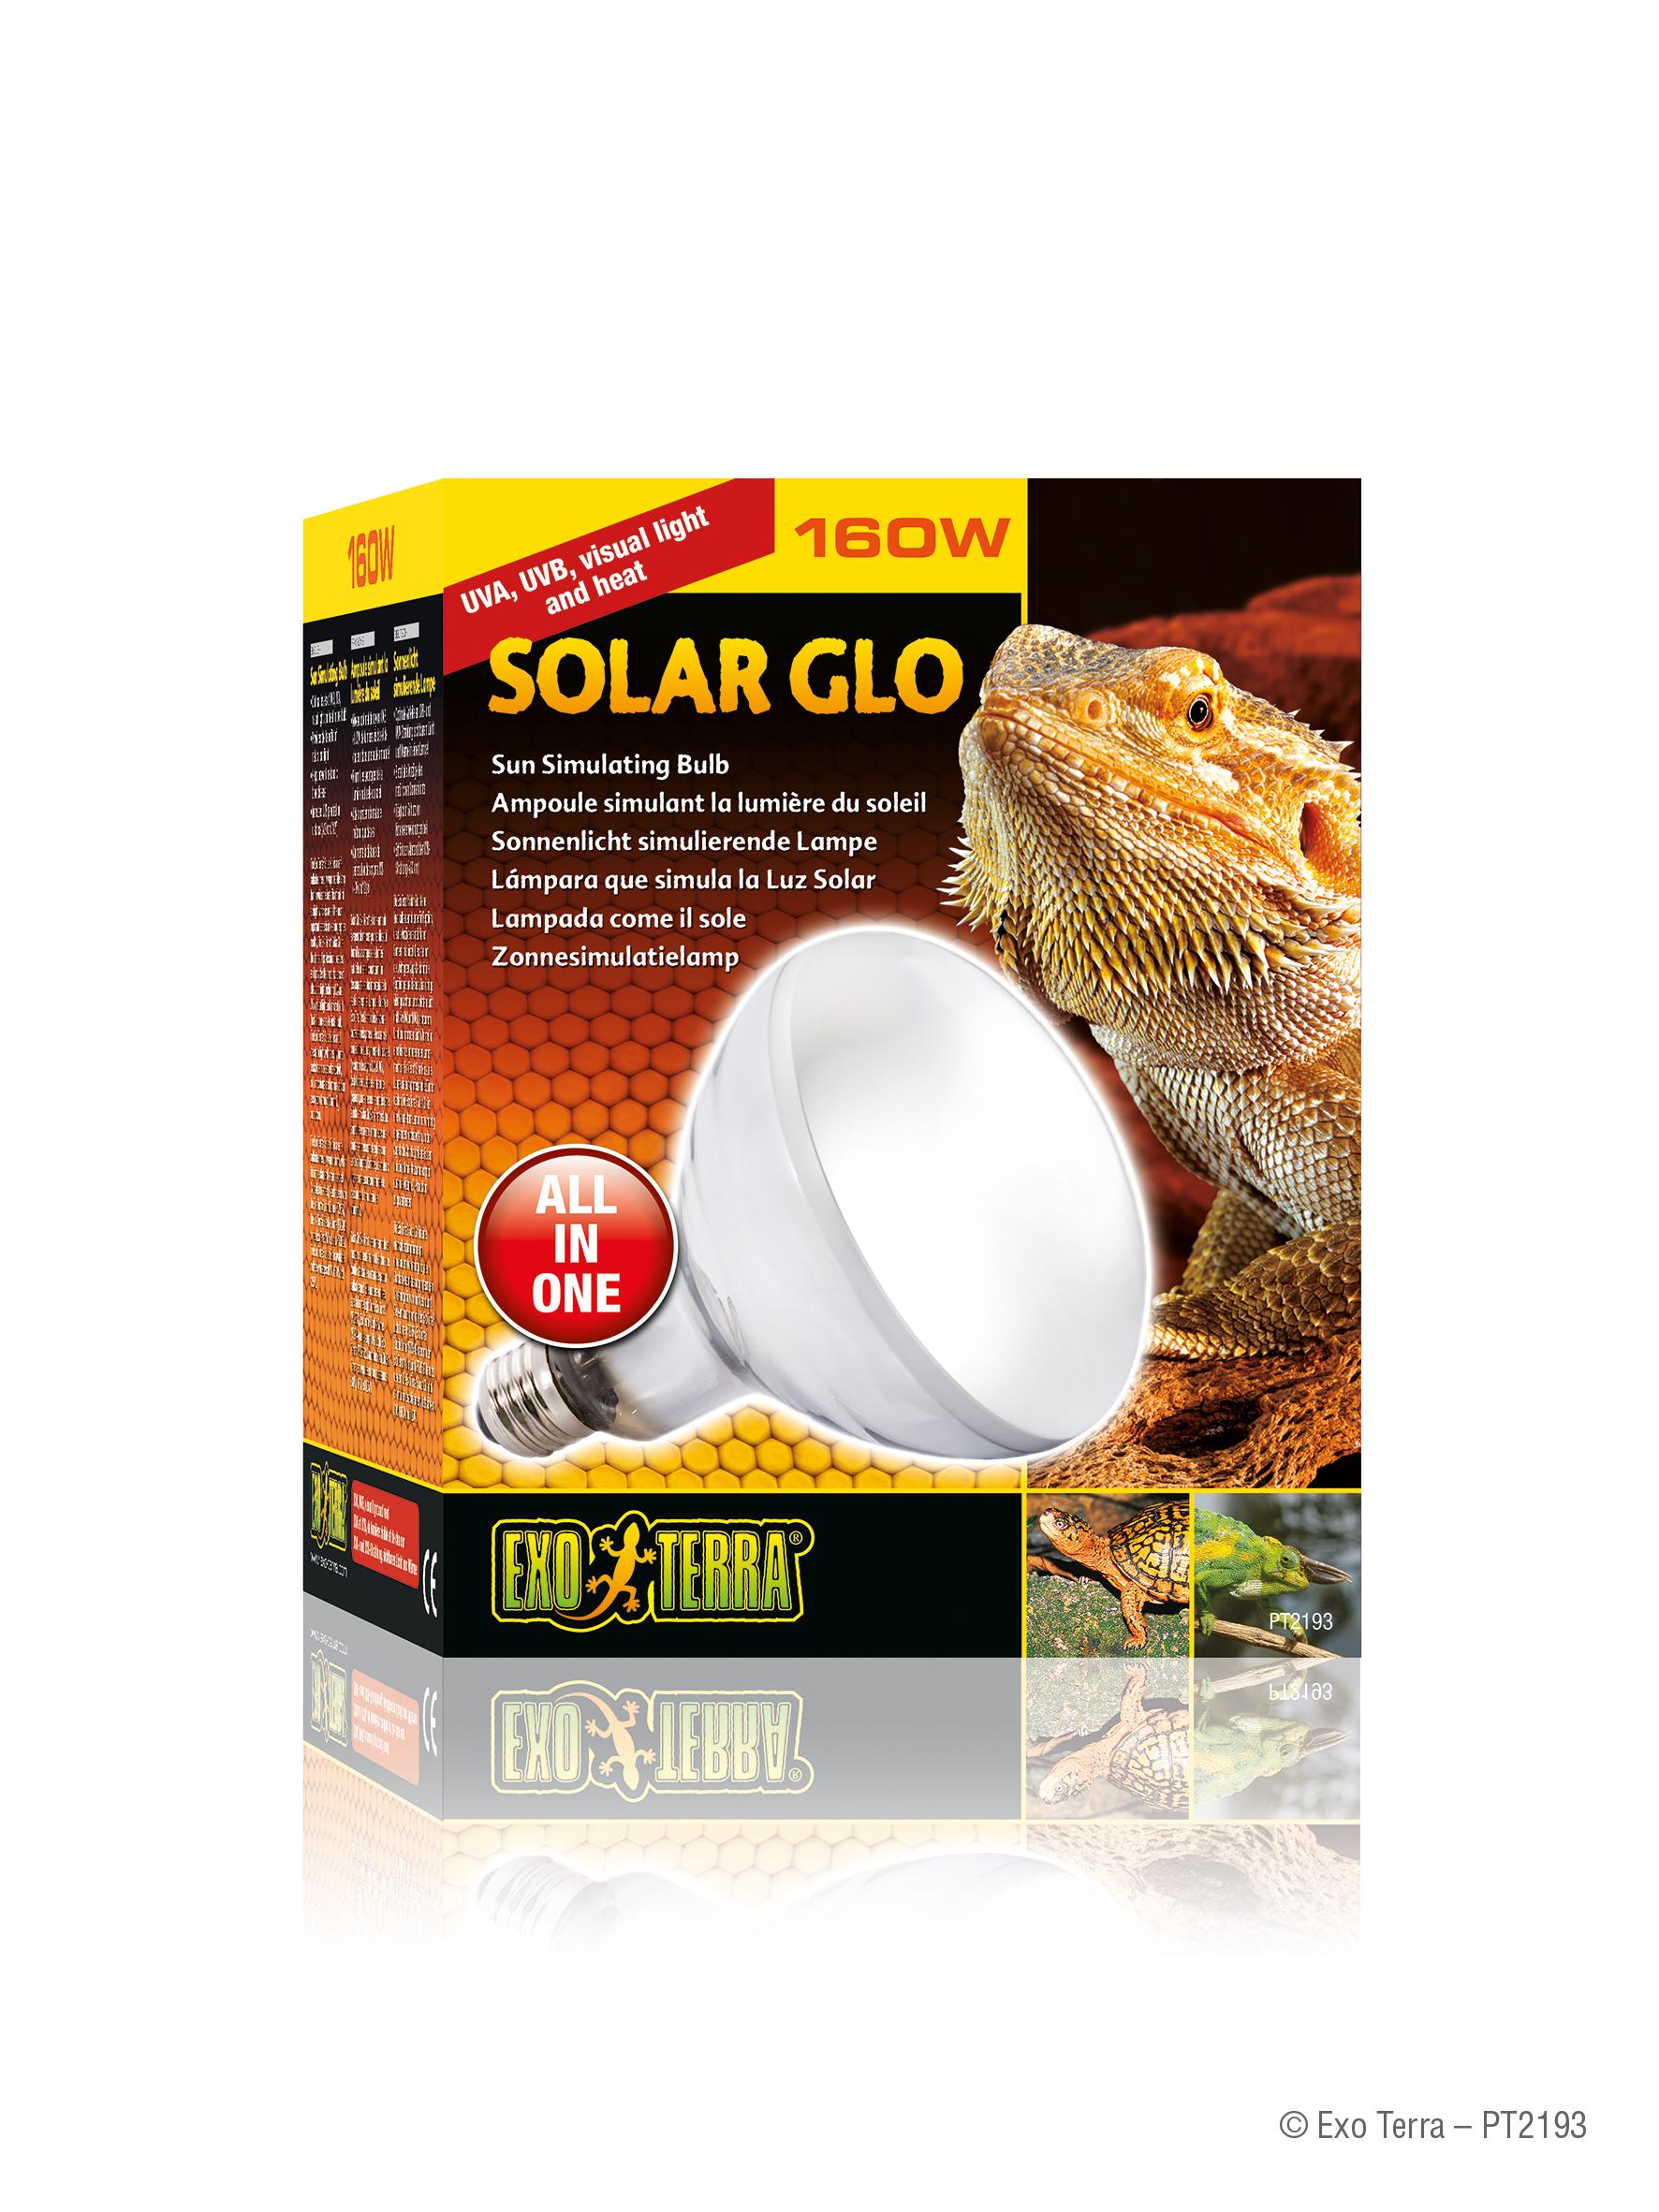 Đèn Solar Glo 160w ( 3 trong 1)